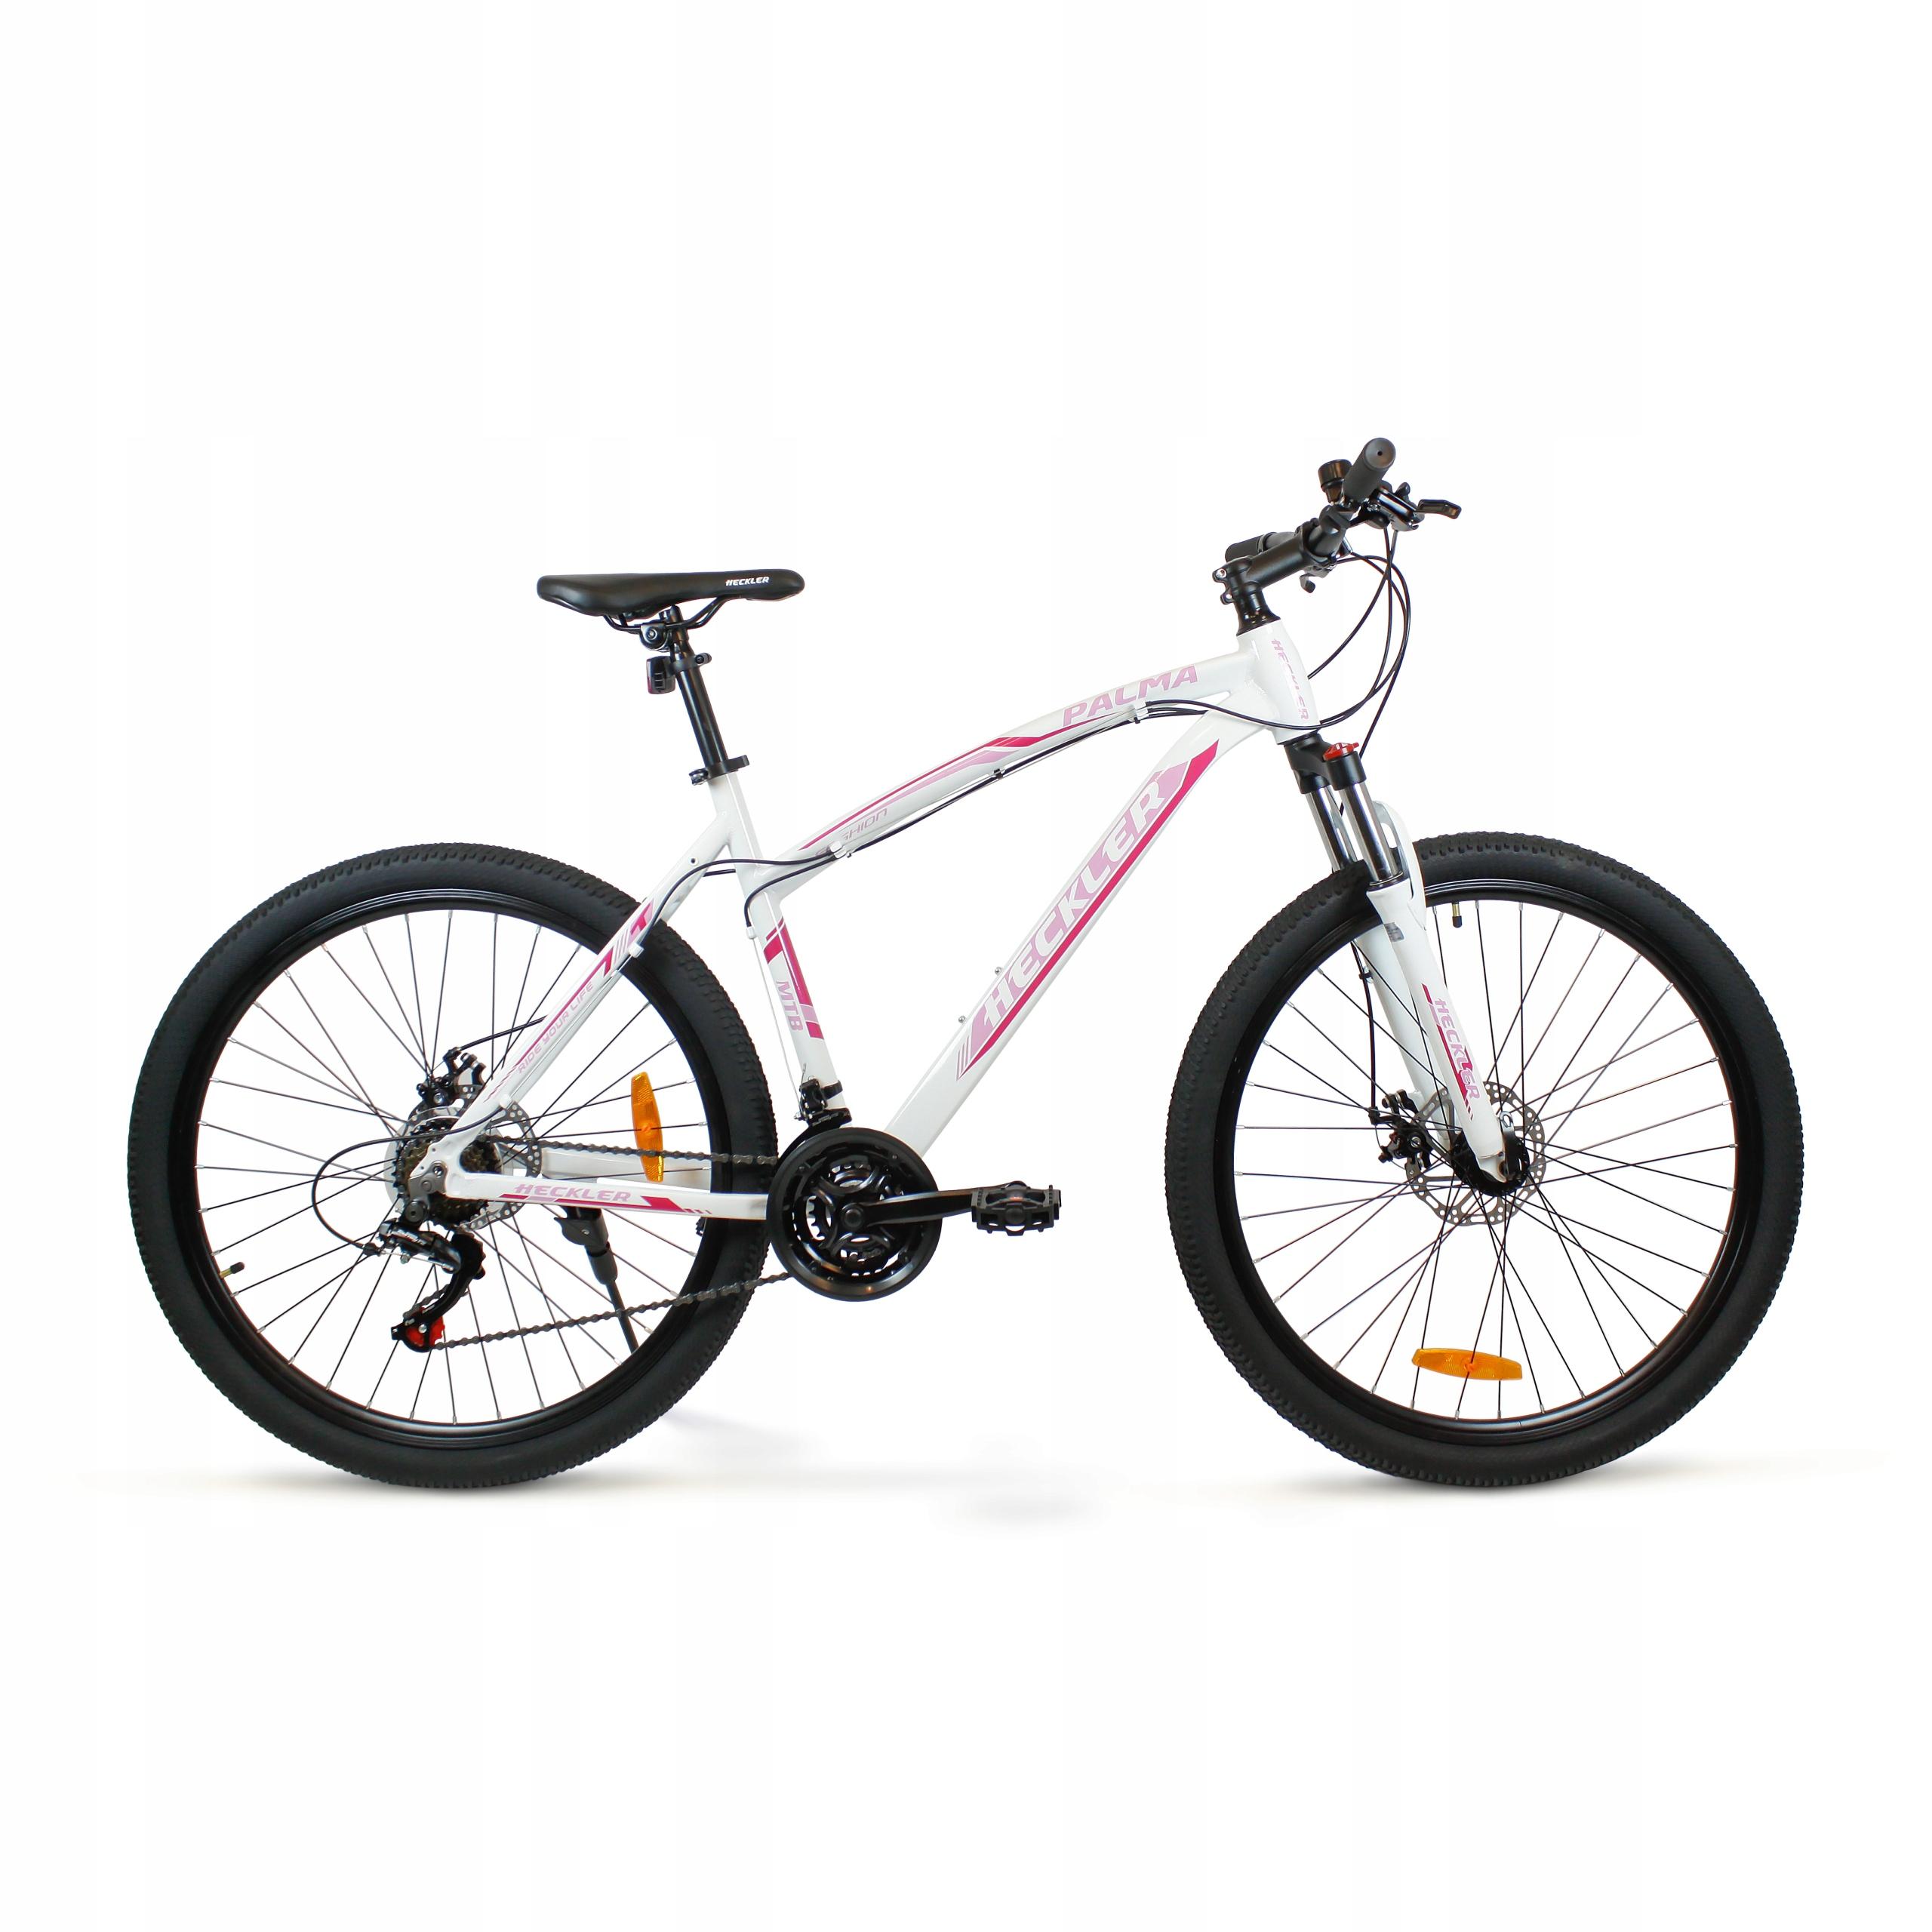 велосипед PALMA ALU 27,5 TARCZOWE HAMULCE SHIMANO